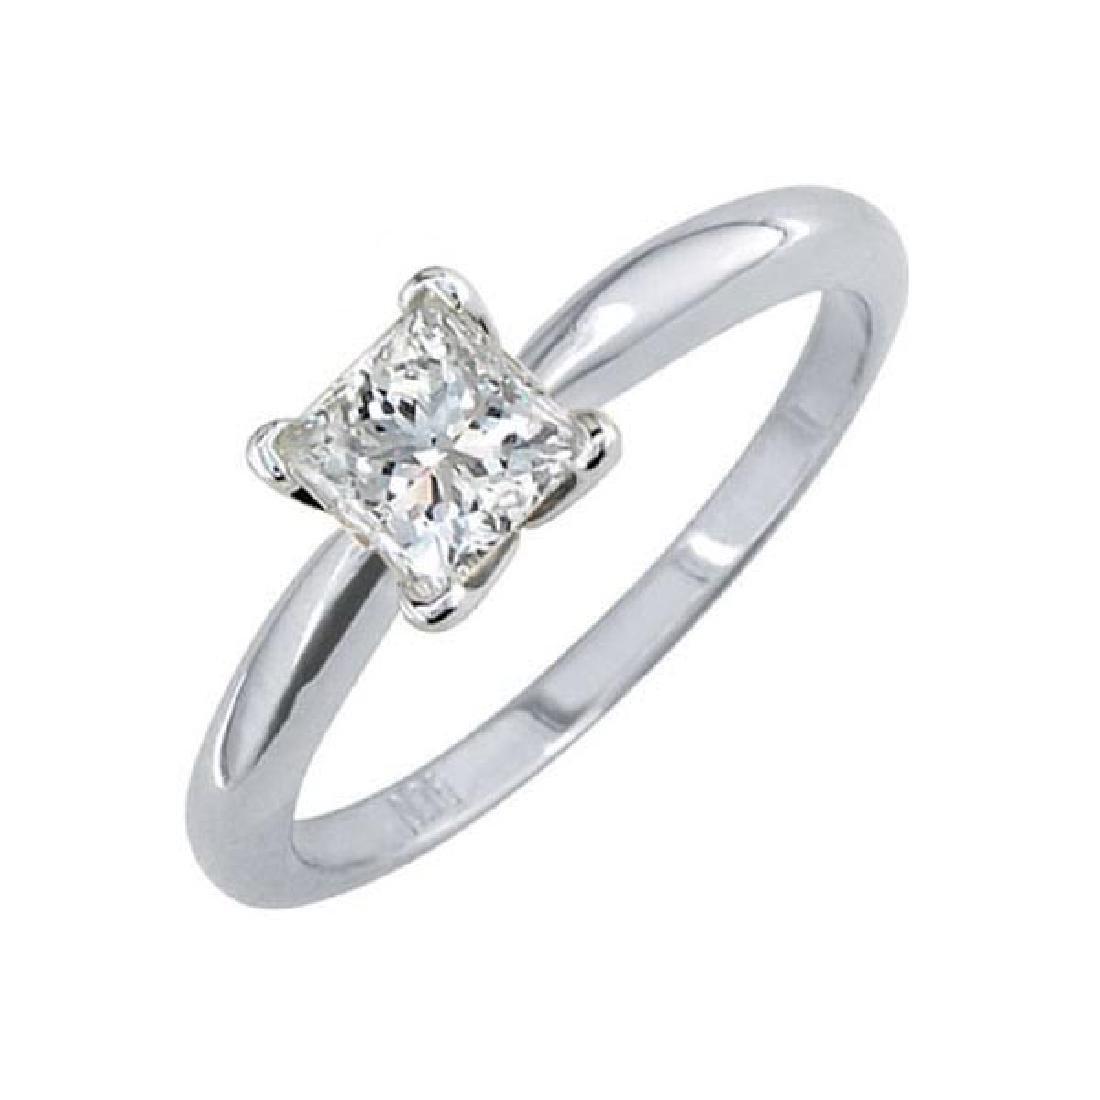 Certified 0.91 CTW Princess Diamond Solitaire 14k Ring